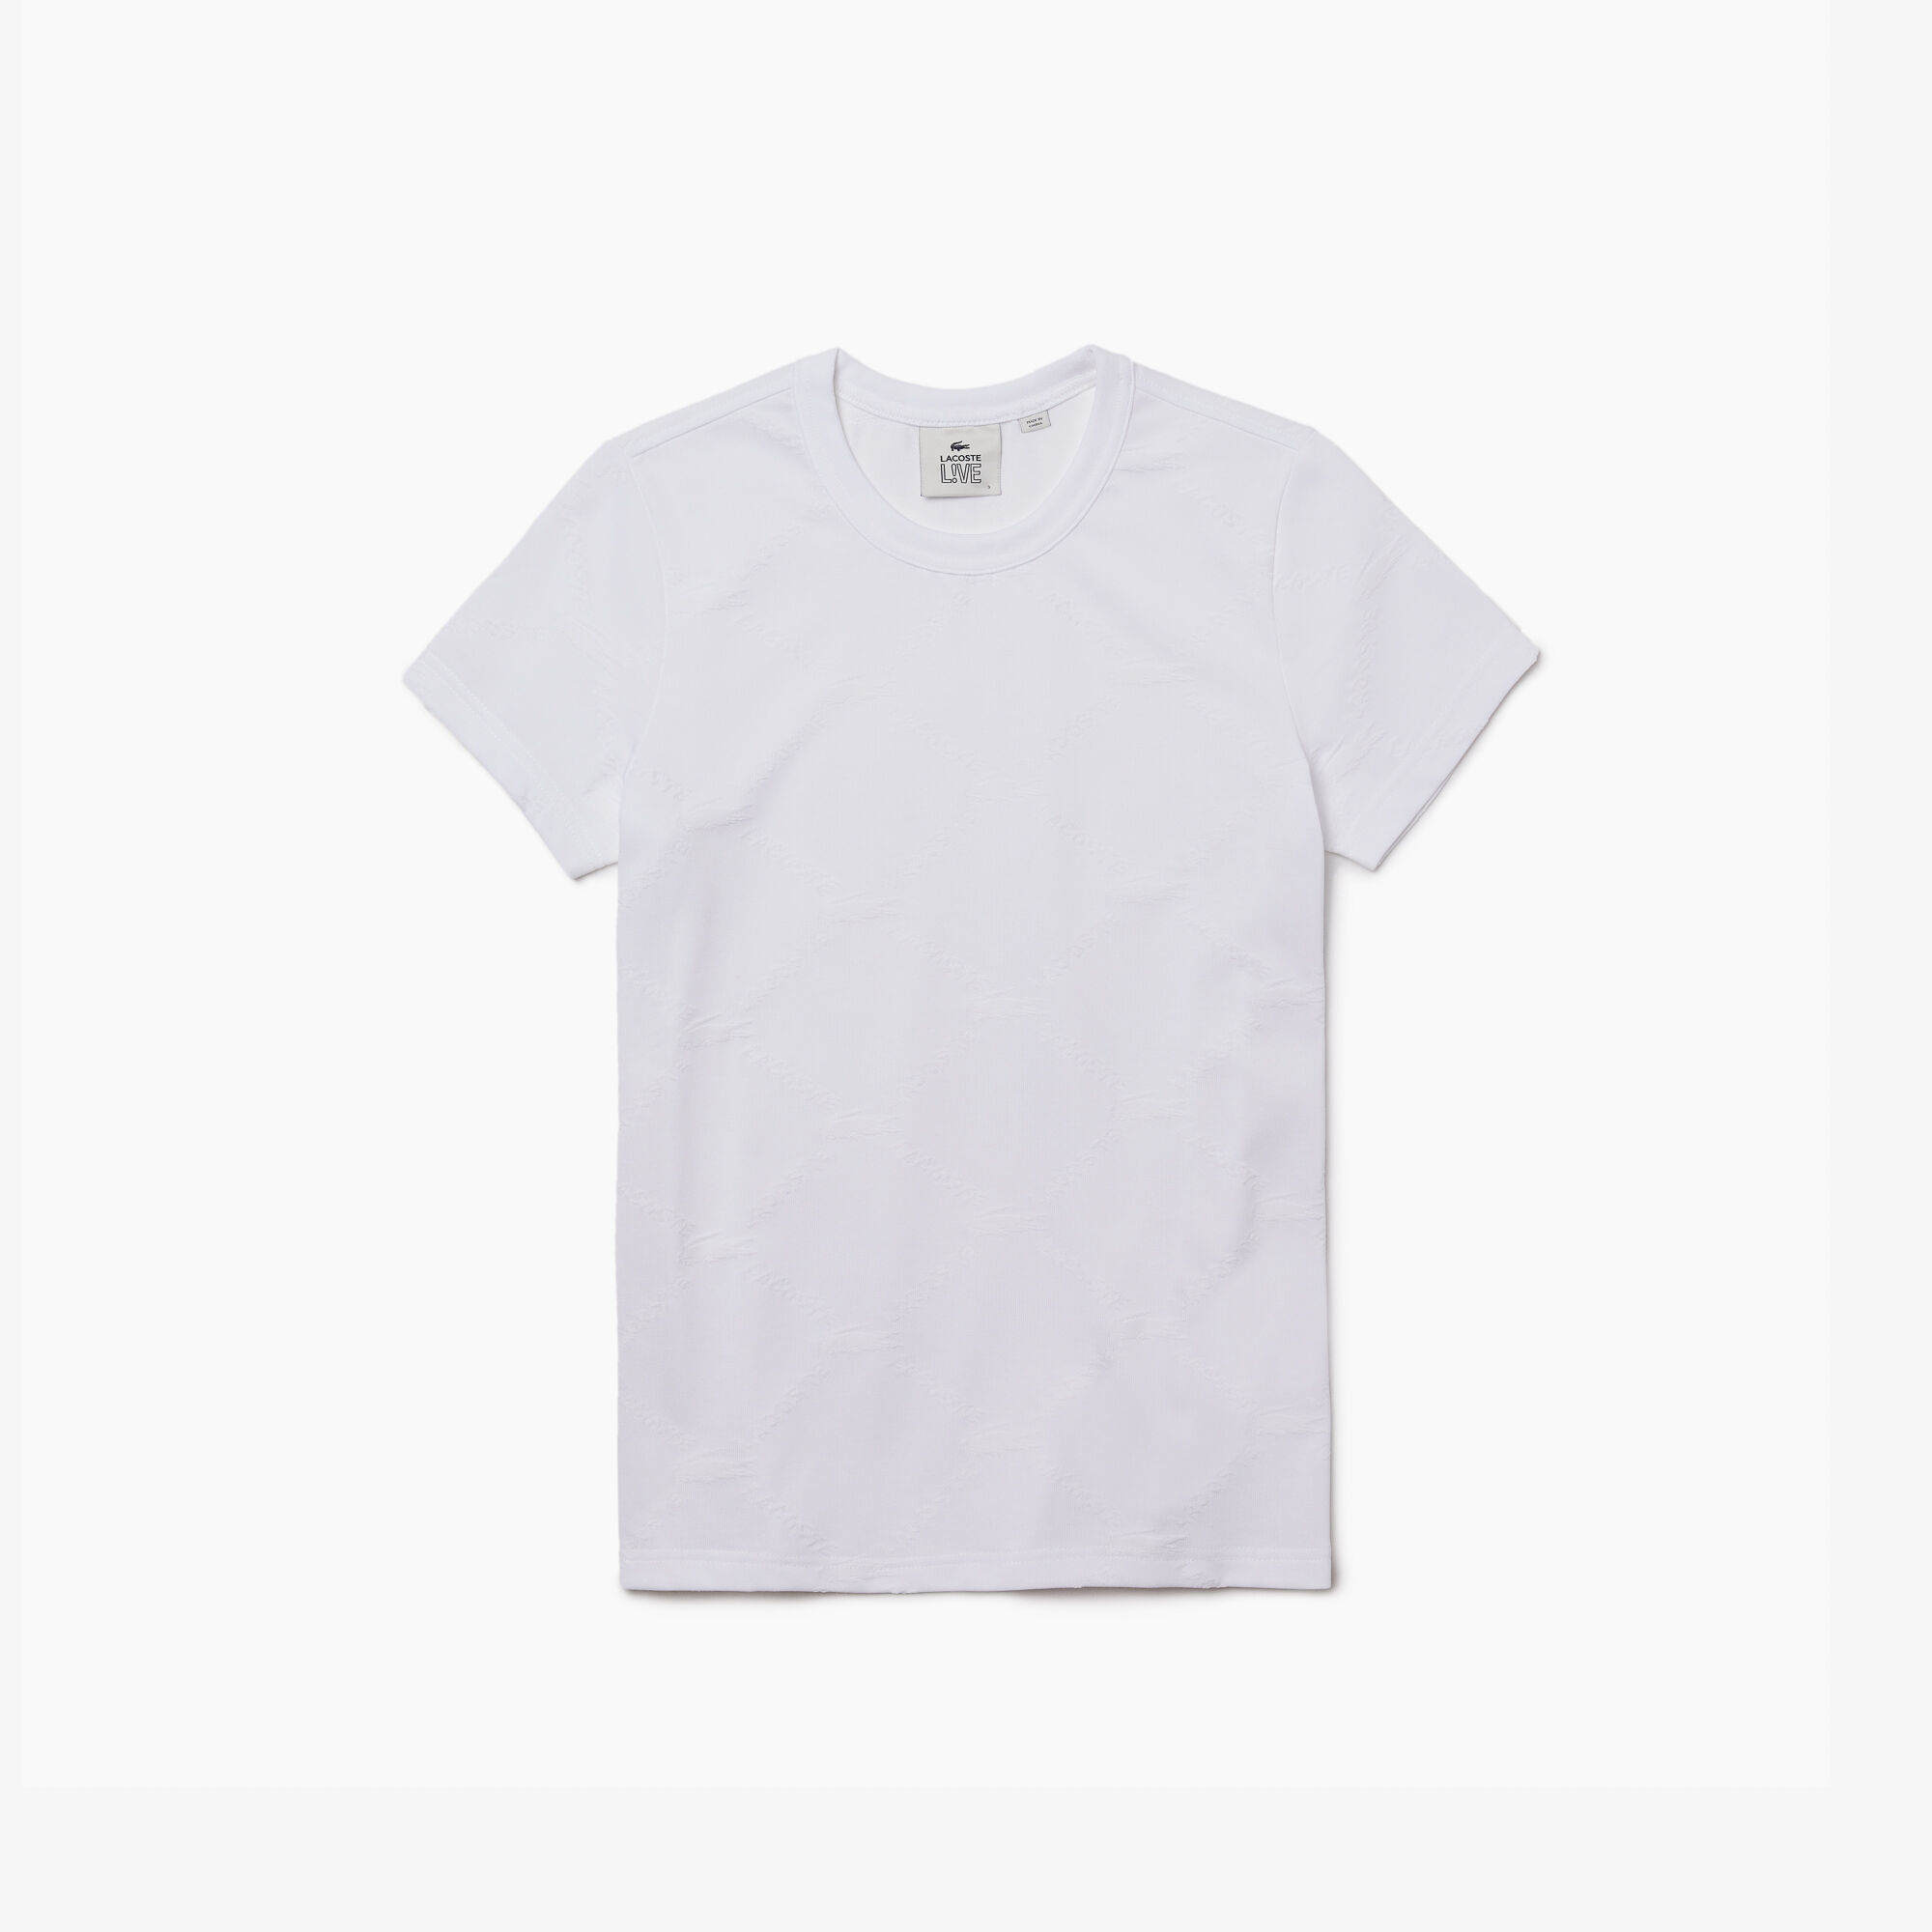 Women's Lacoste LIVE Crew neck Monogram Patterned T-shirt